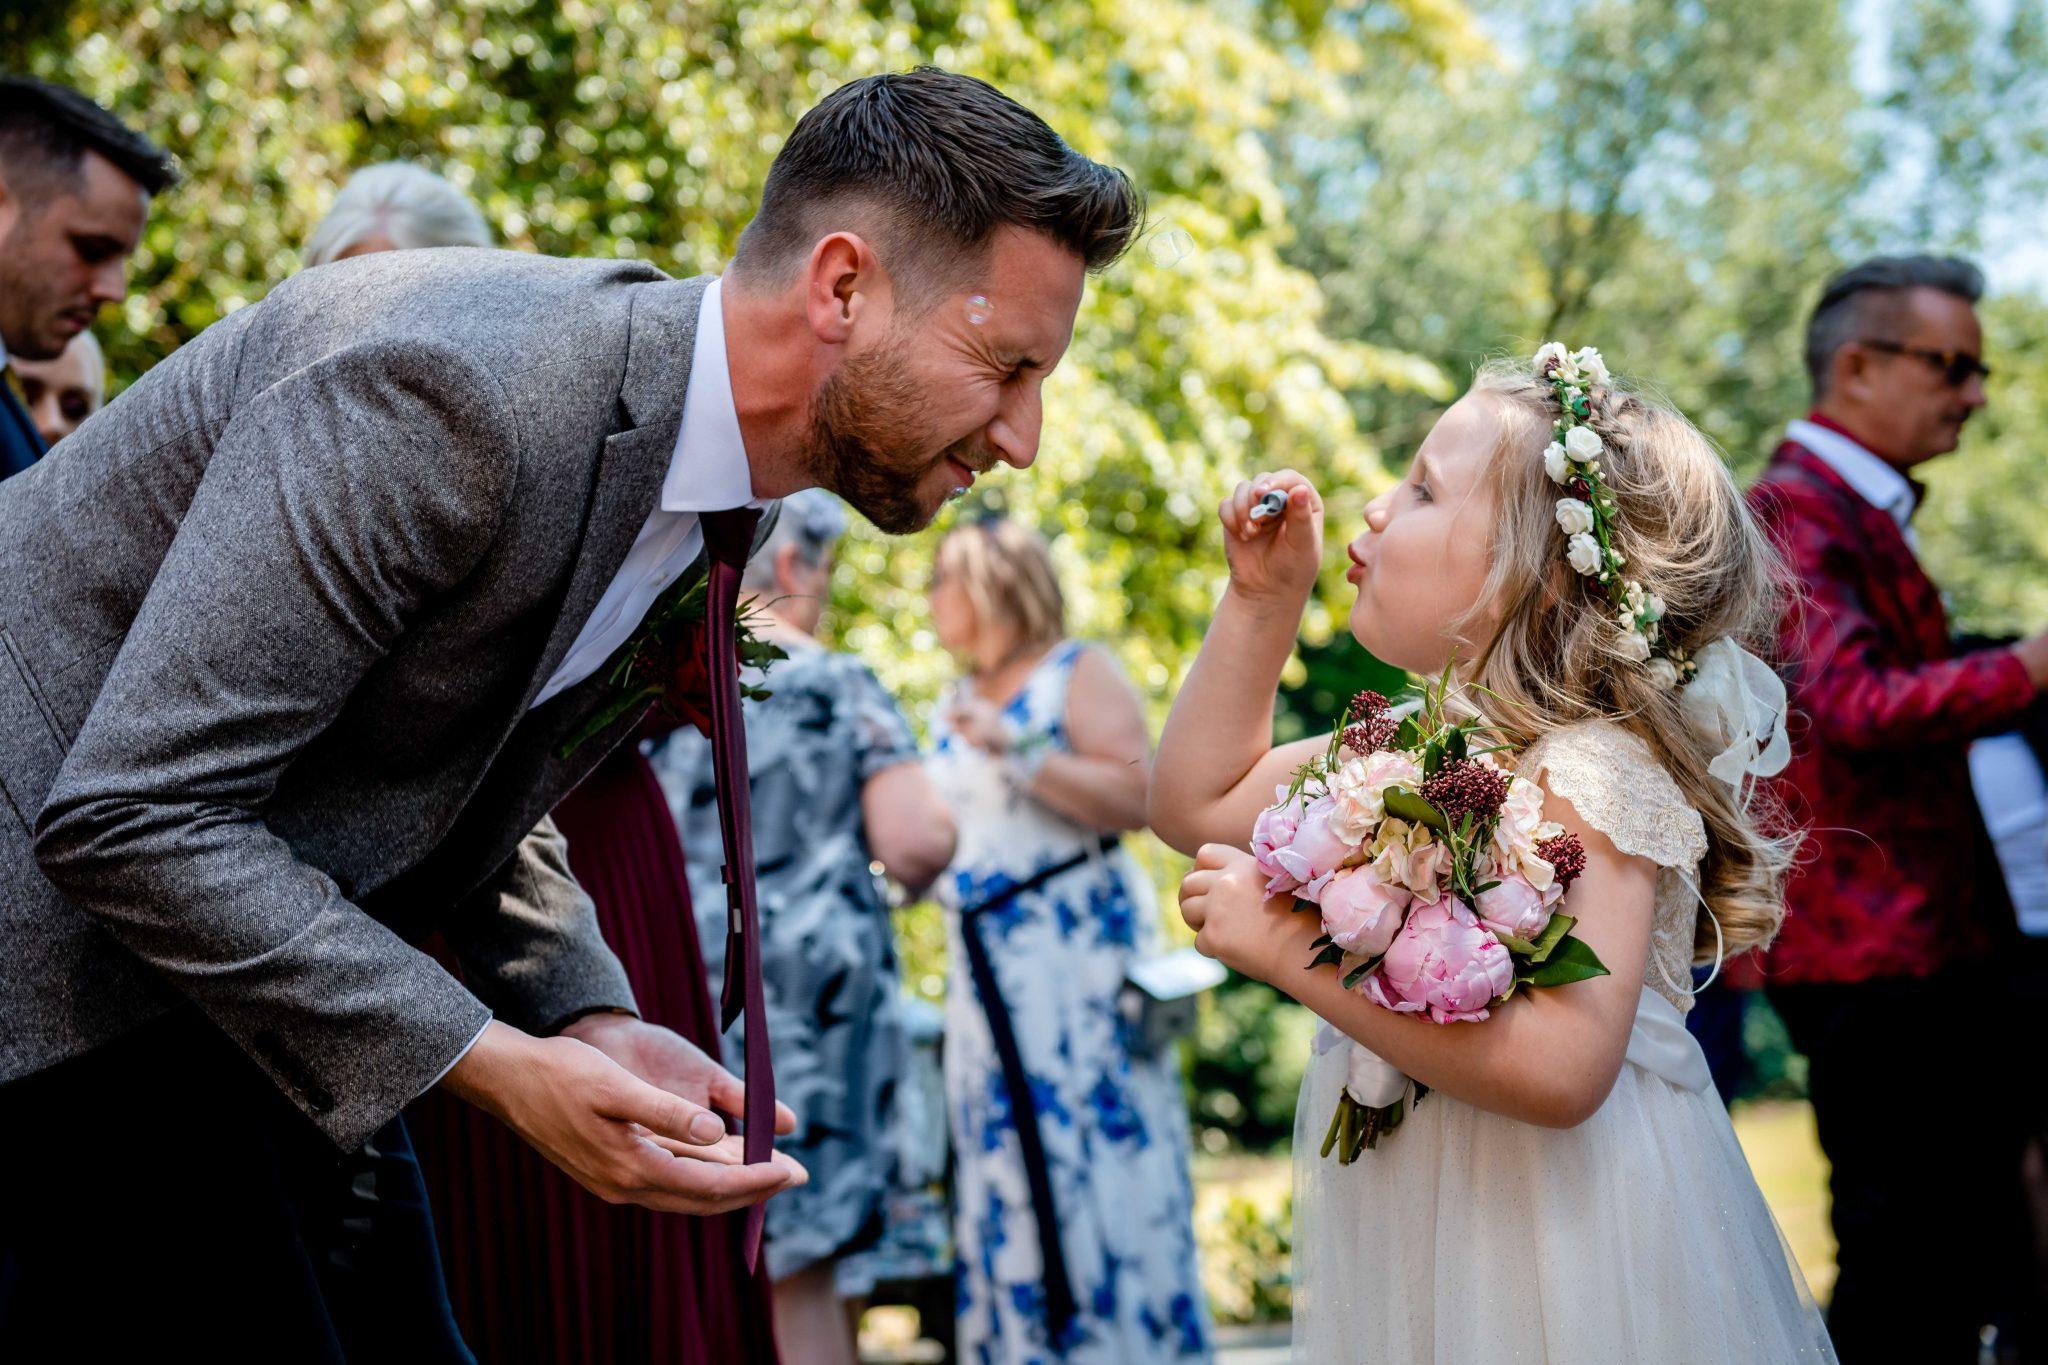 Liverpool Wedding Photographer Ollie Gyte Photography